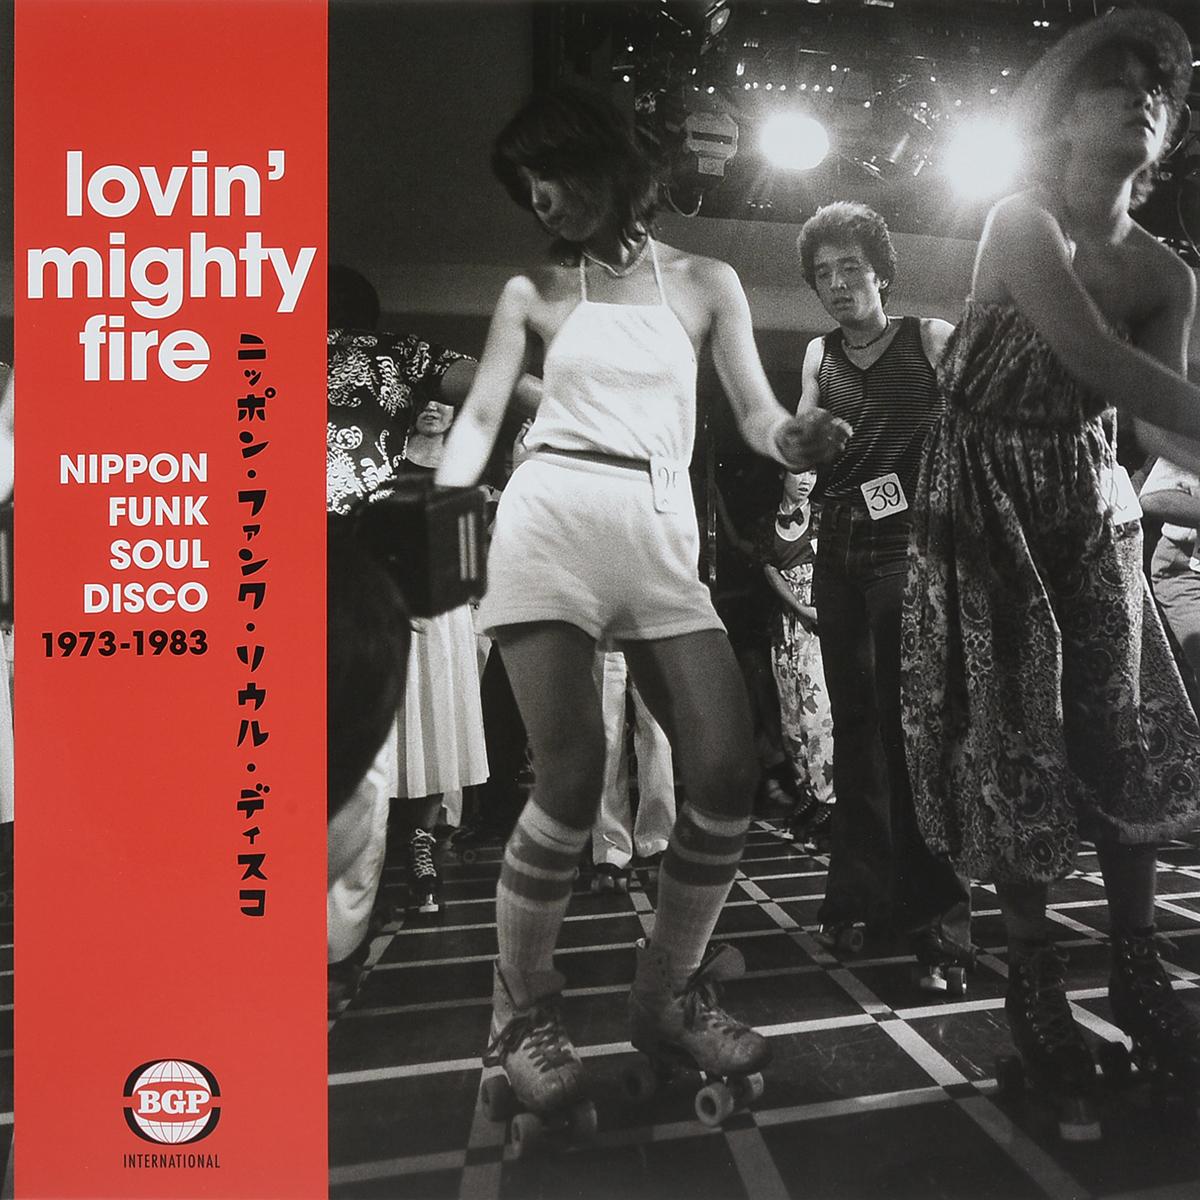 лучшая цена Lovin' Mighty Fire: Nippon Funk * Soul * Disco 1973-1983 (2 LP)